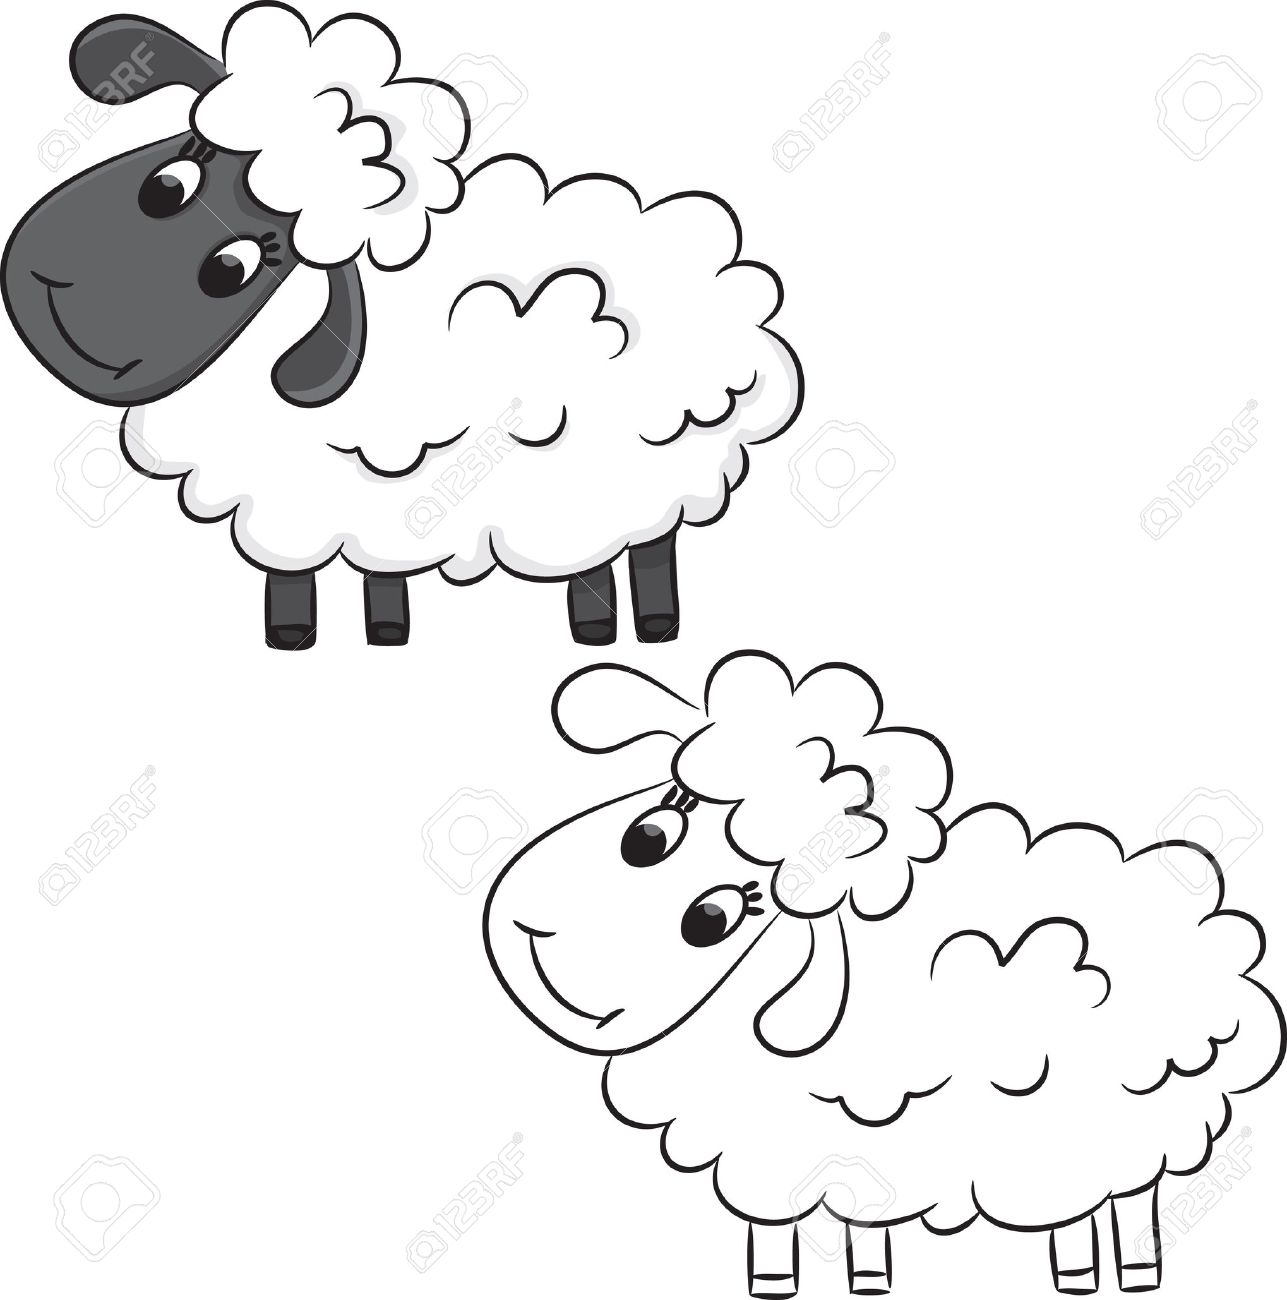 Cartoon Sheep Coloring Book Royalty Free Klipartlar Vektor